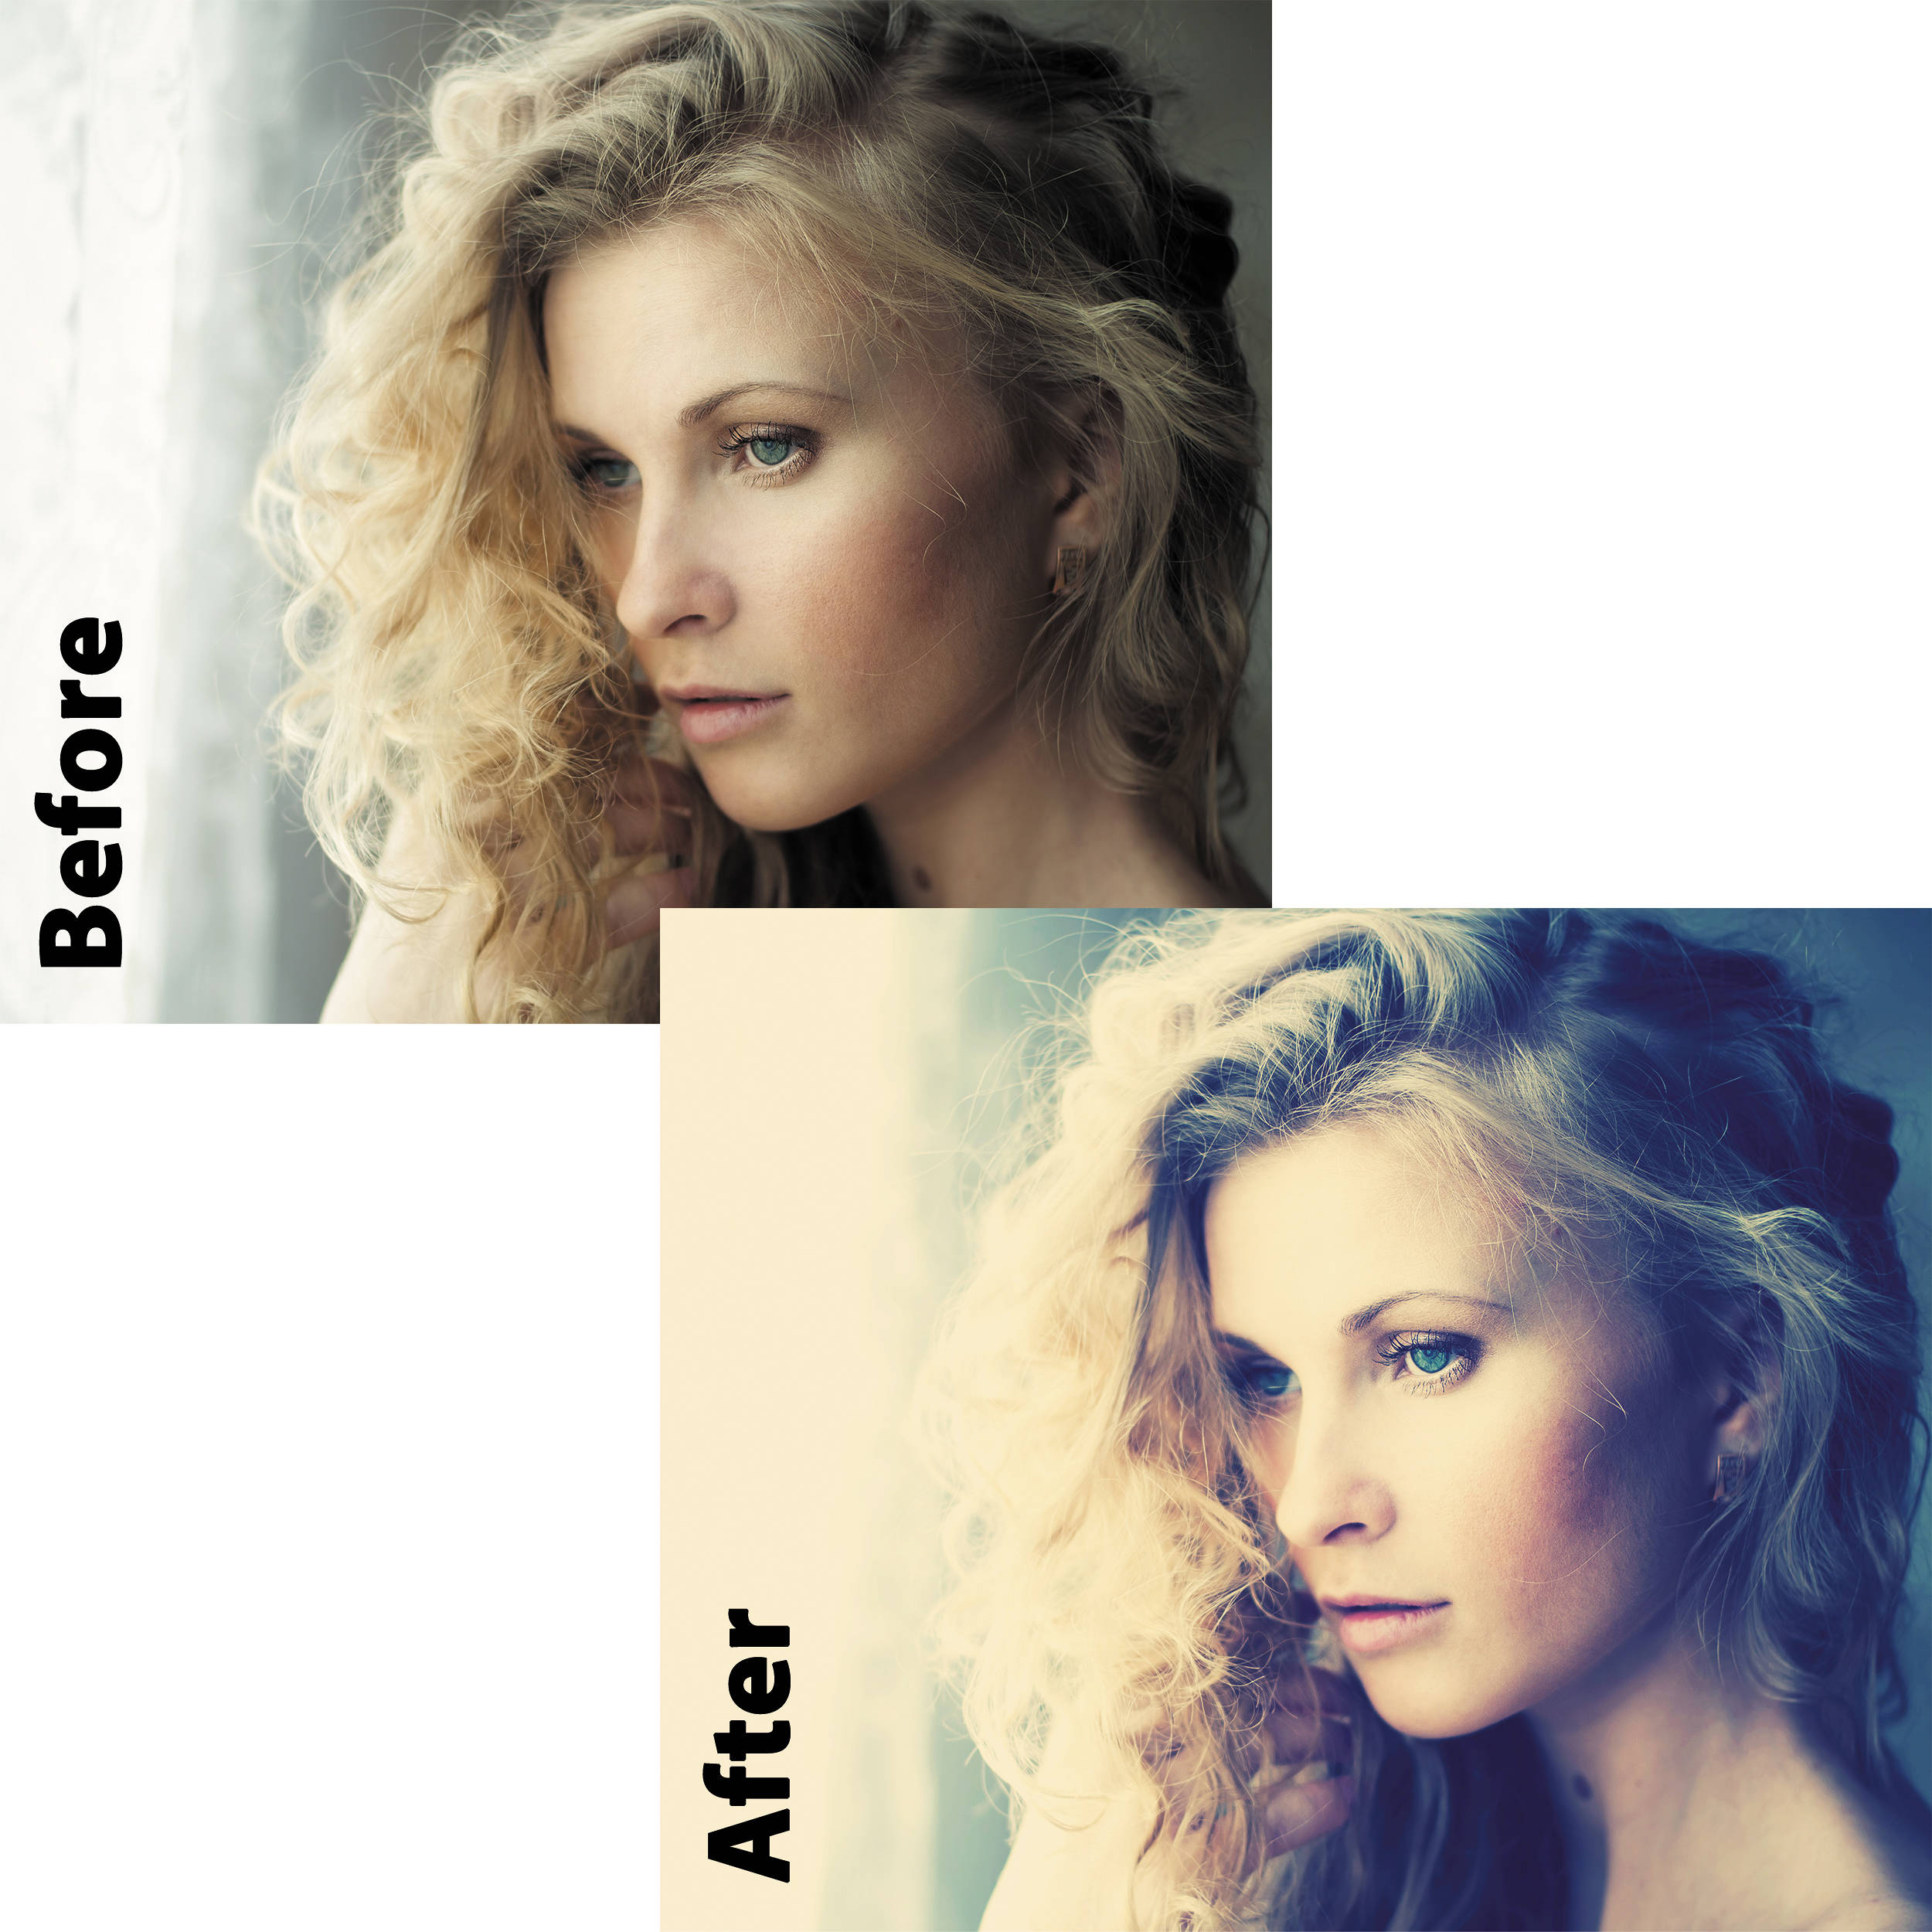 Topaz Labs Photoshop Cs6 Download Photographers Photoshop Photoshop Elegant Imagery